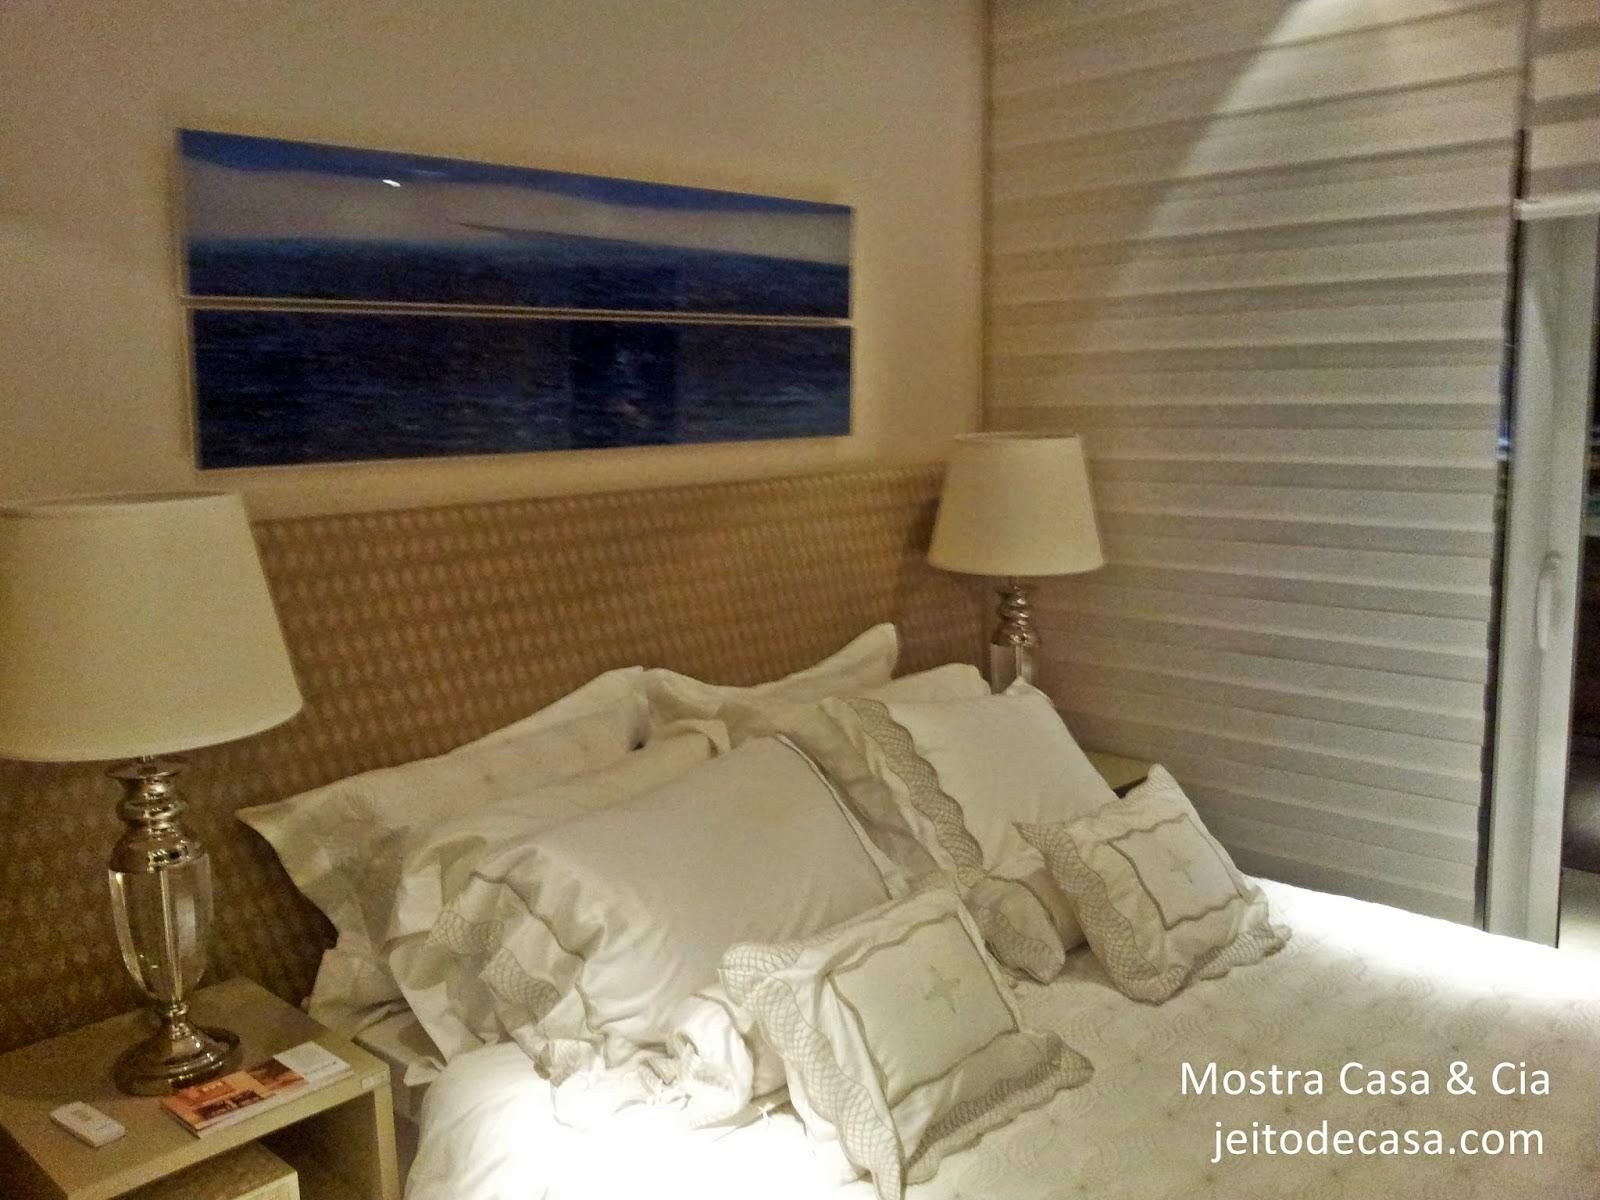 Apartamento modelo da Mostra Casa & Cia Jeito de Casa Blog de  #674926 1600 1200